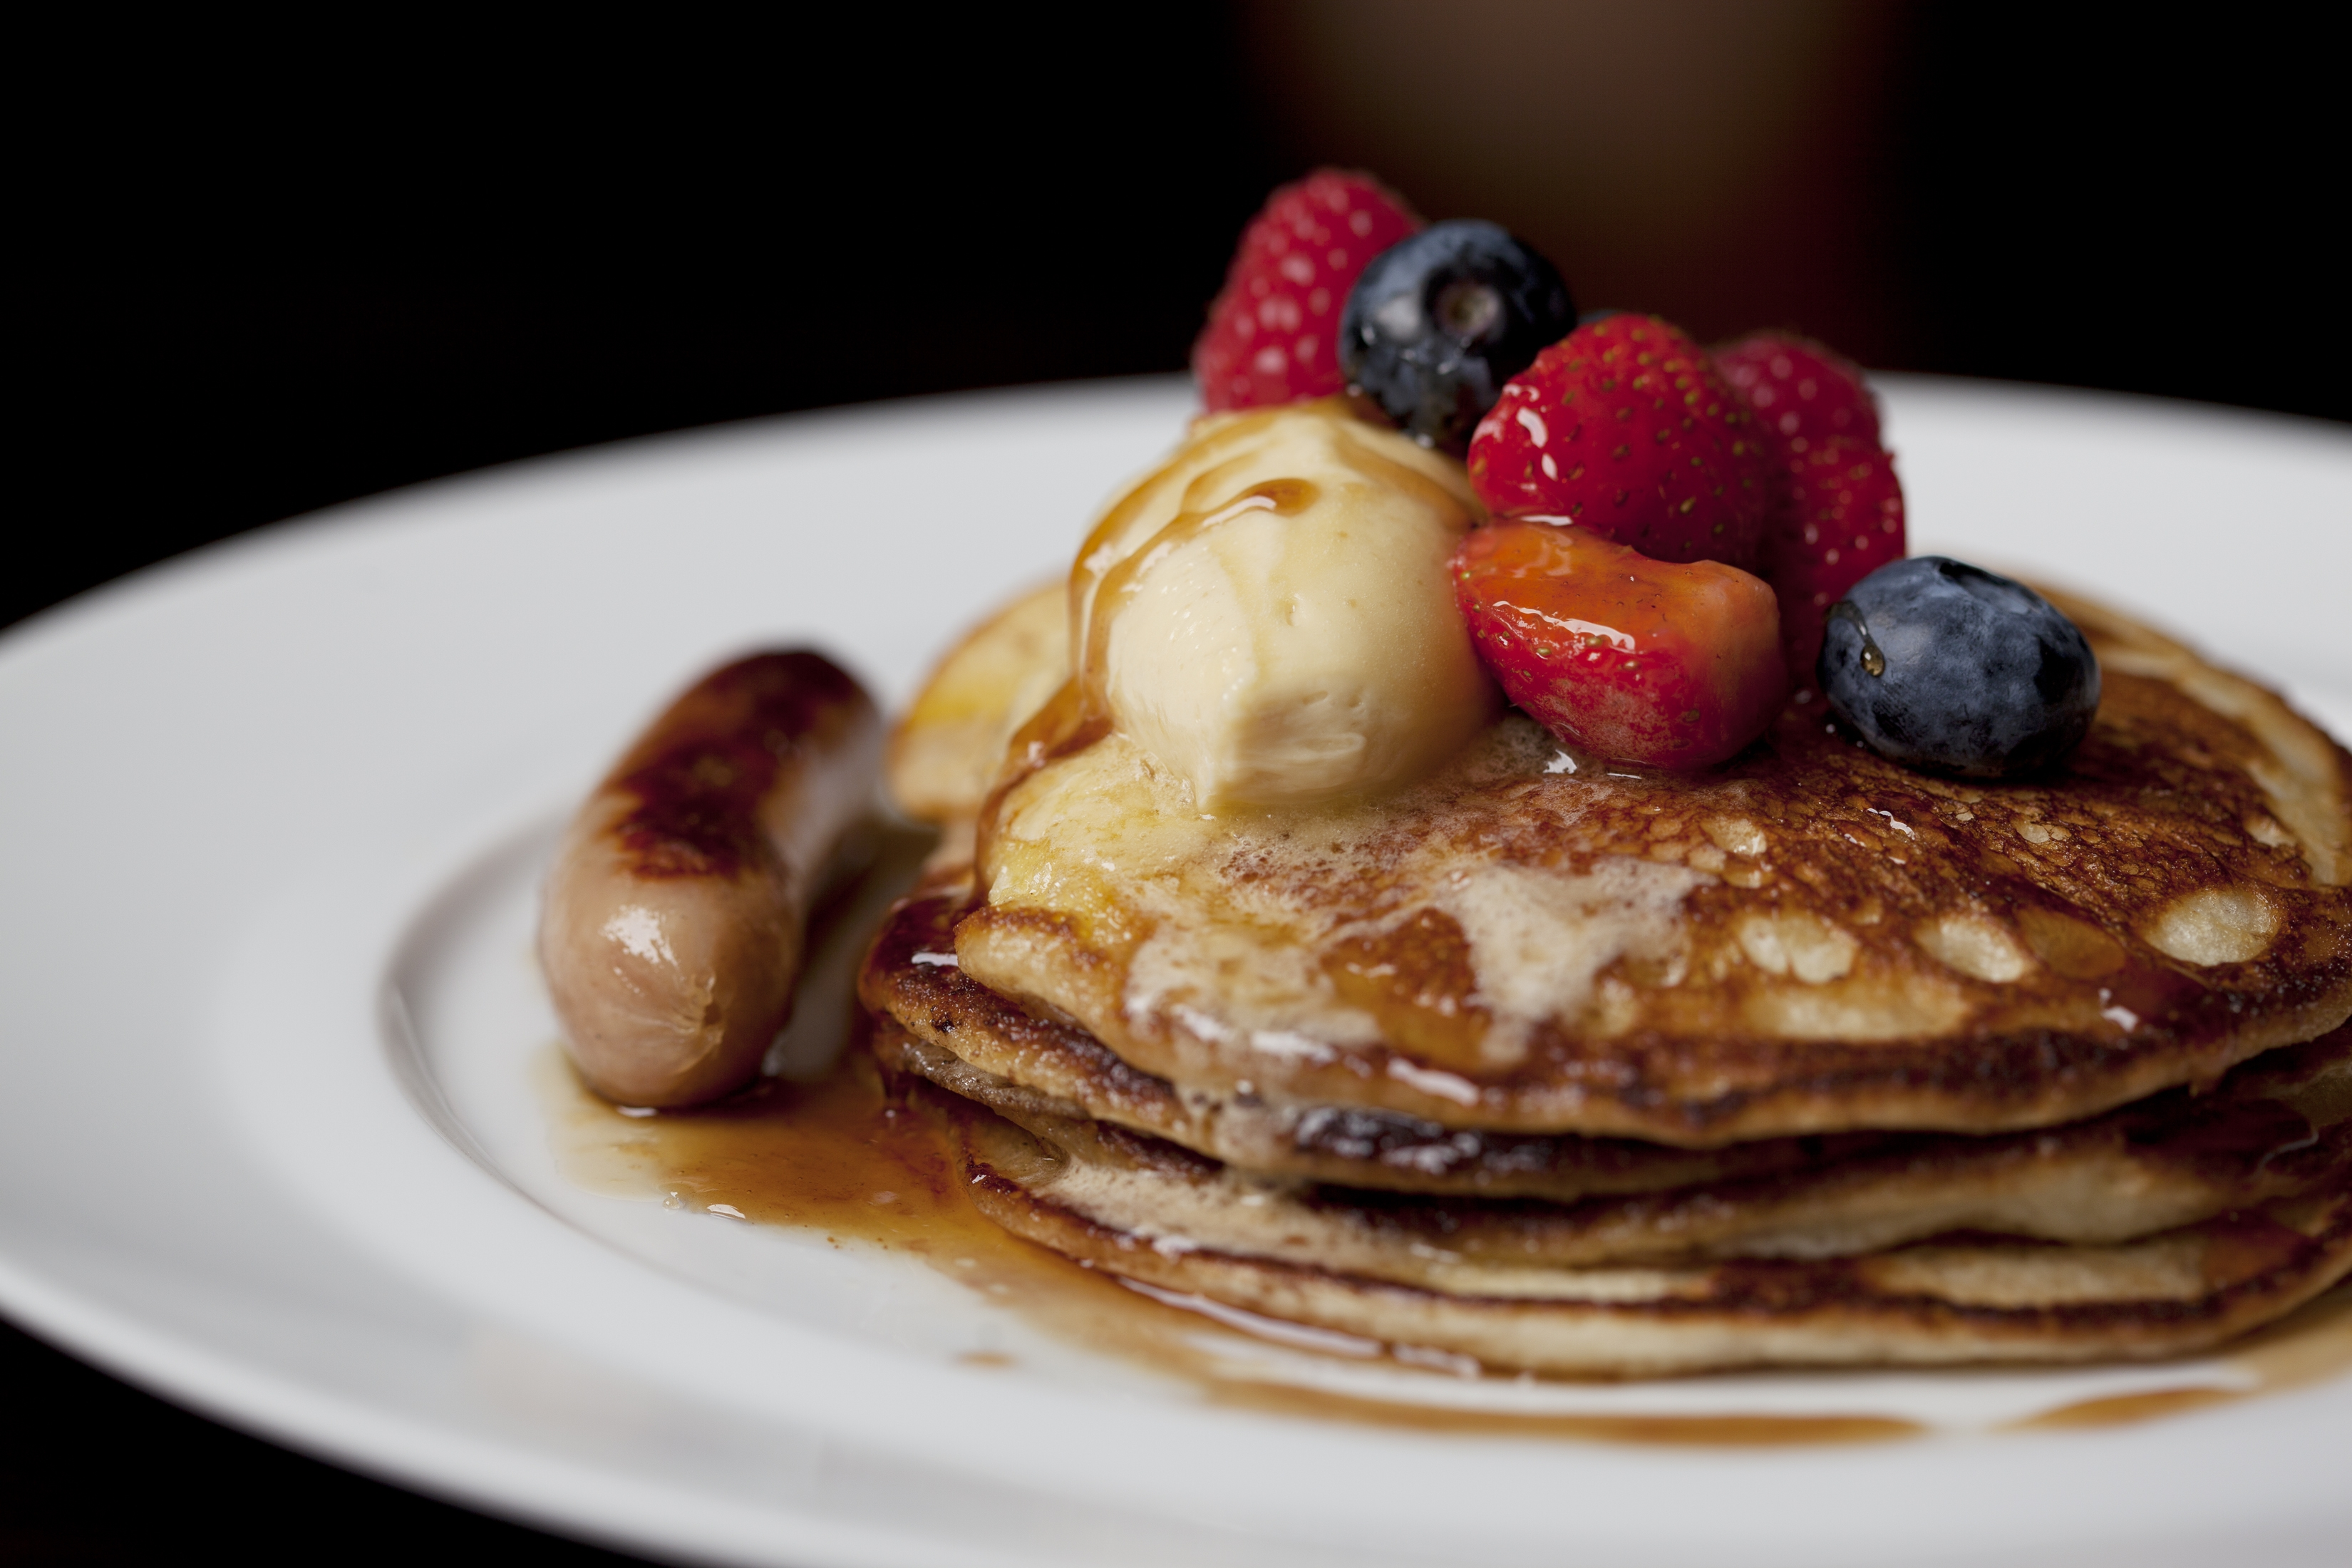 The Top 3: Pancakes